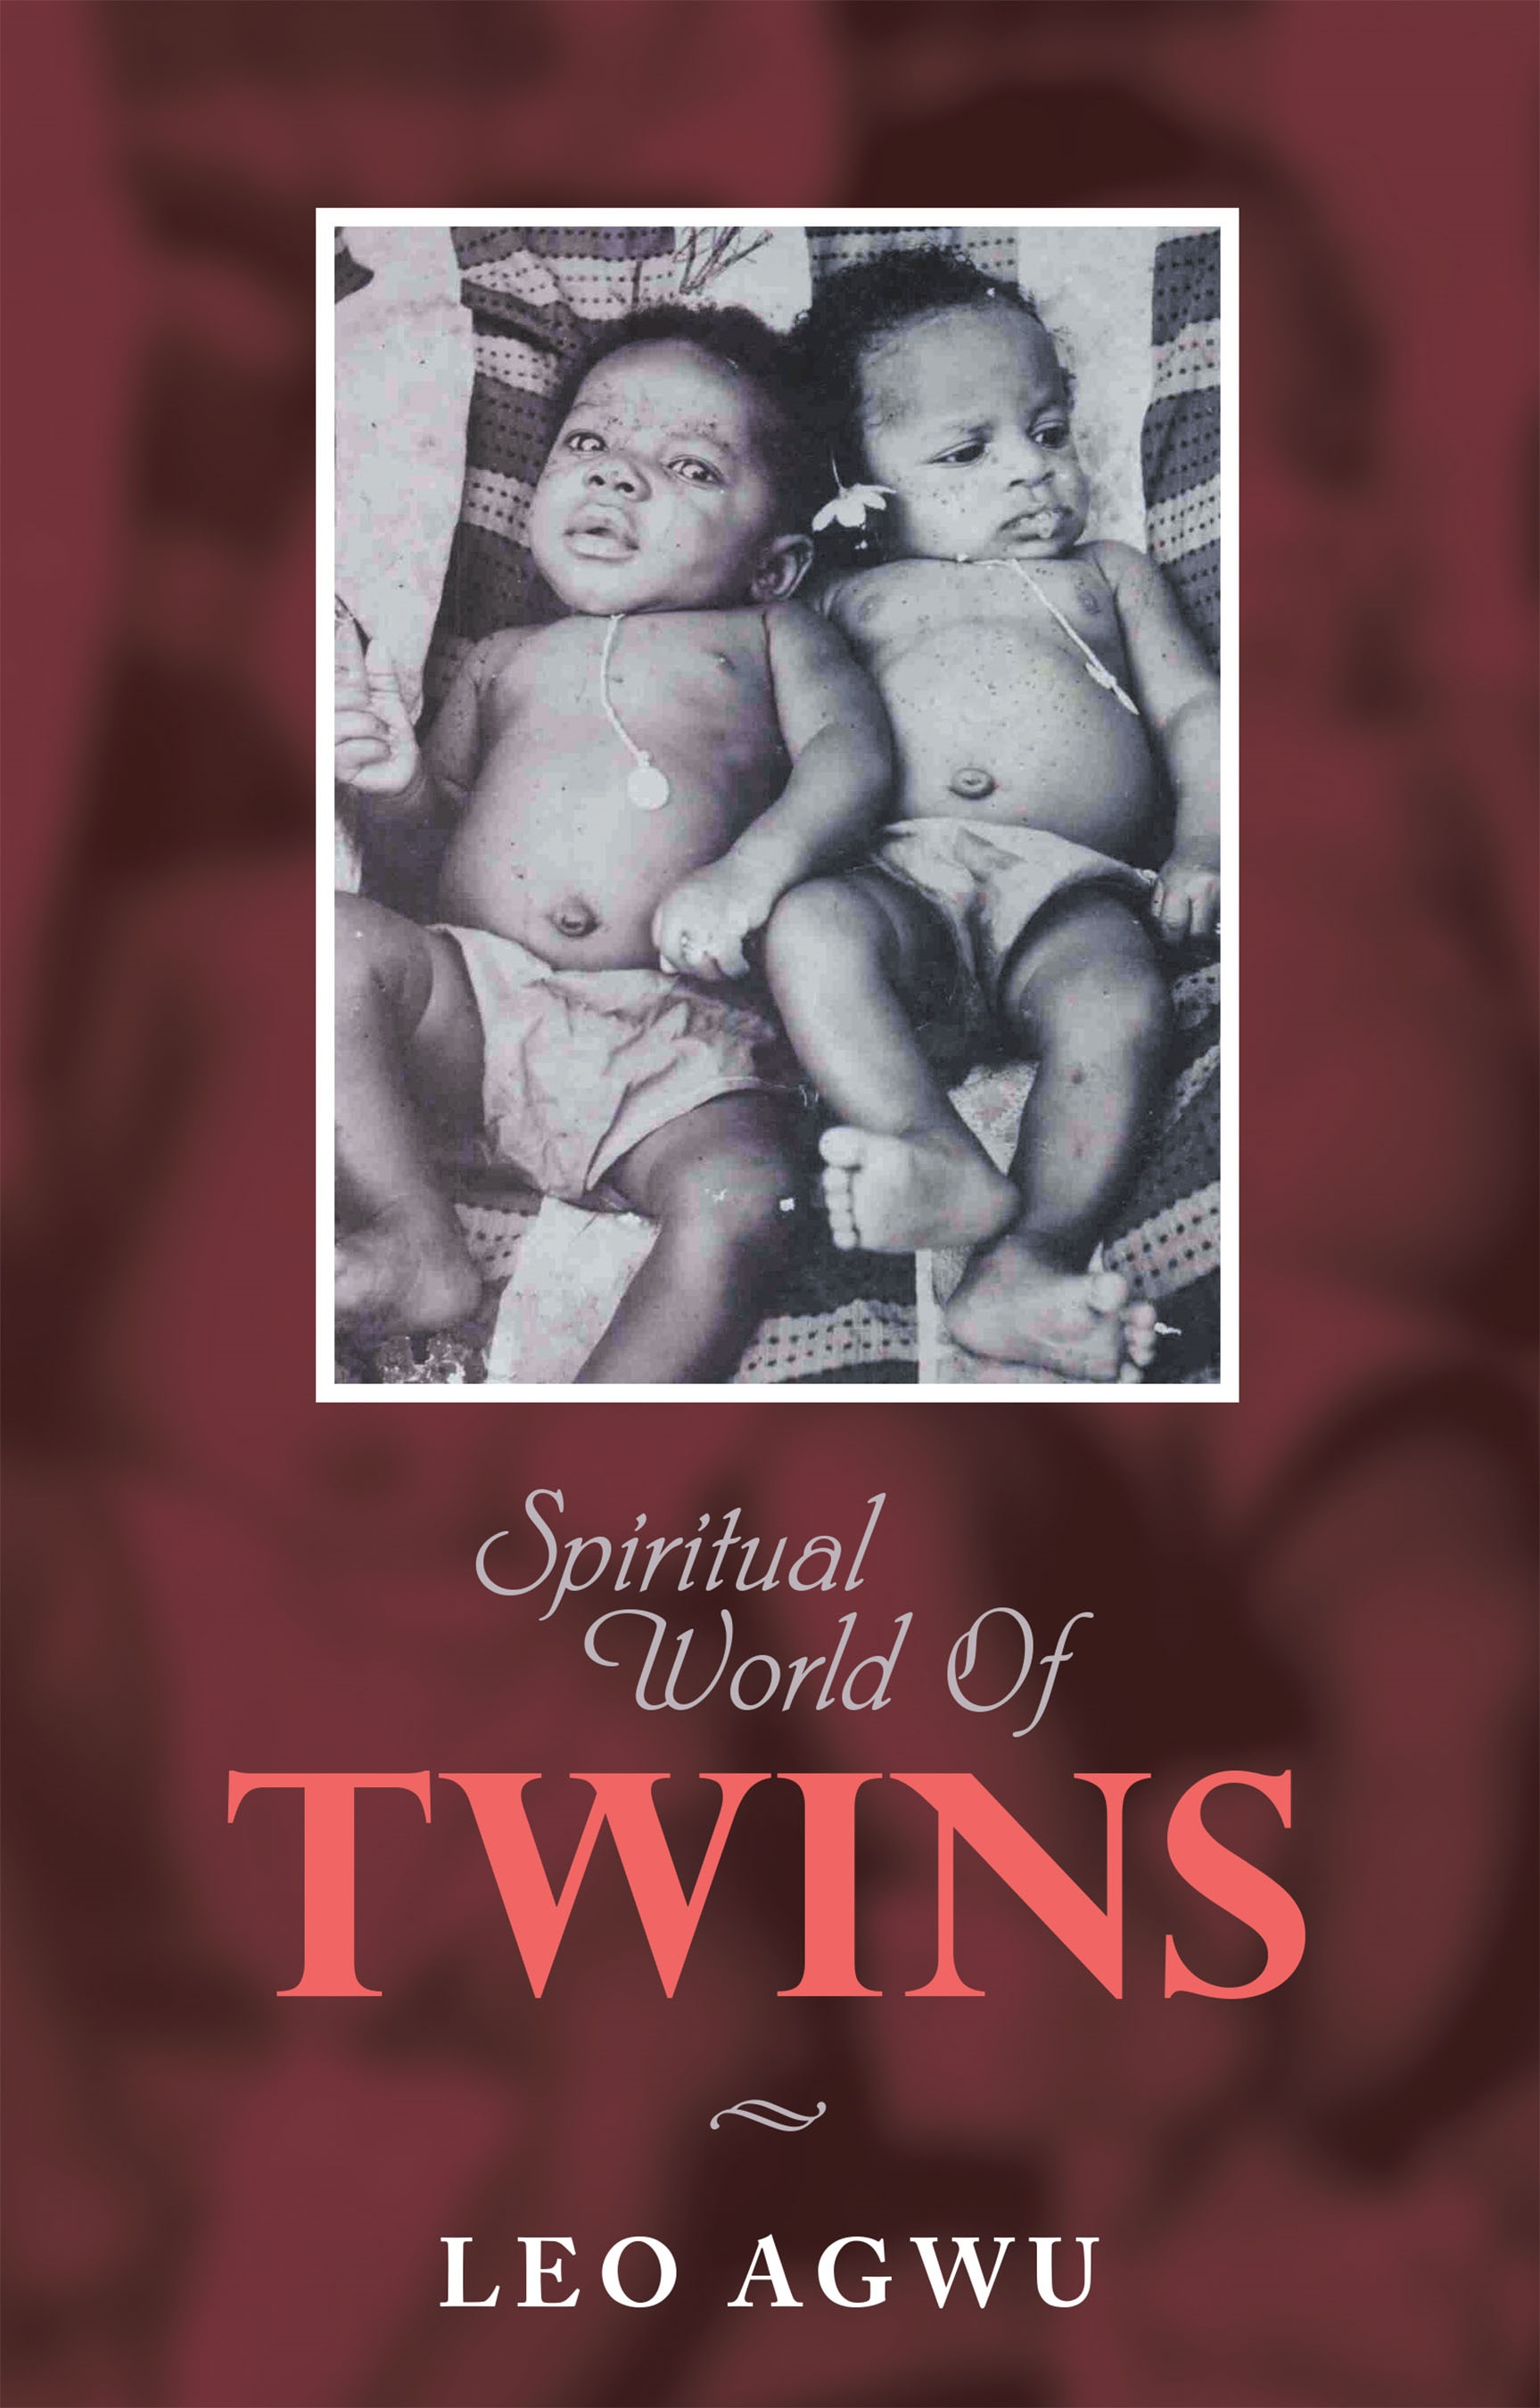 Spiritual World of Twins